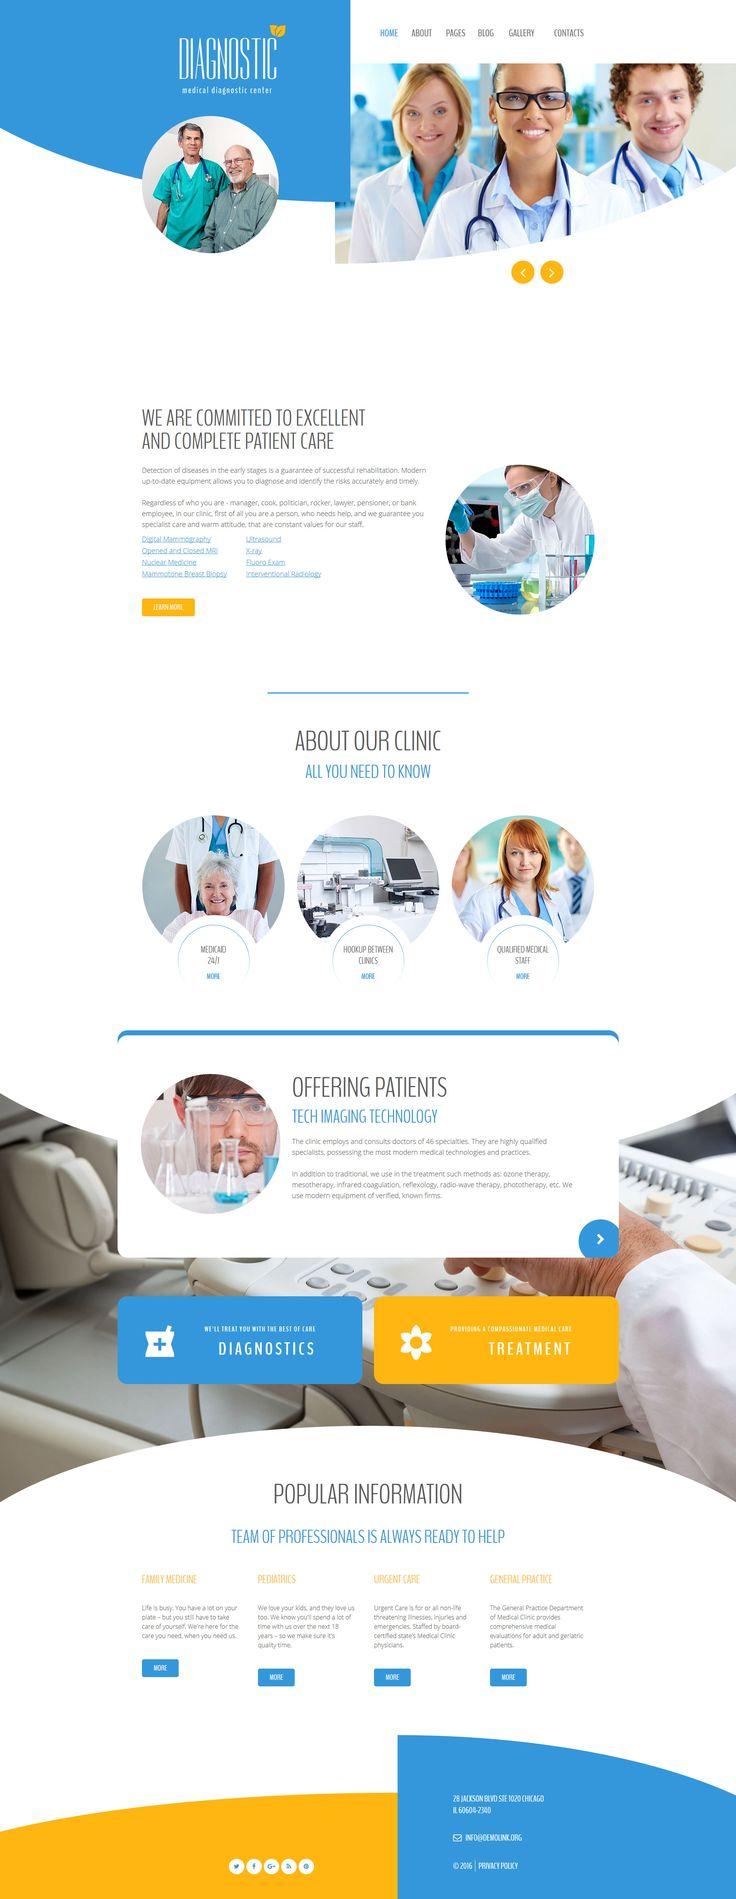 Medical Responsive Joomla Template - http://www.templatemonster.com/joomla-templates/medical-responsive-joomla-template-60027.html